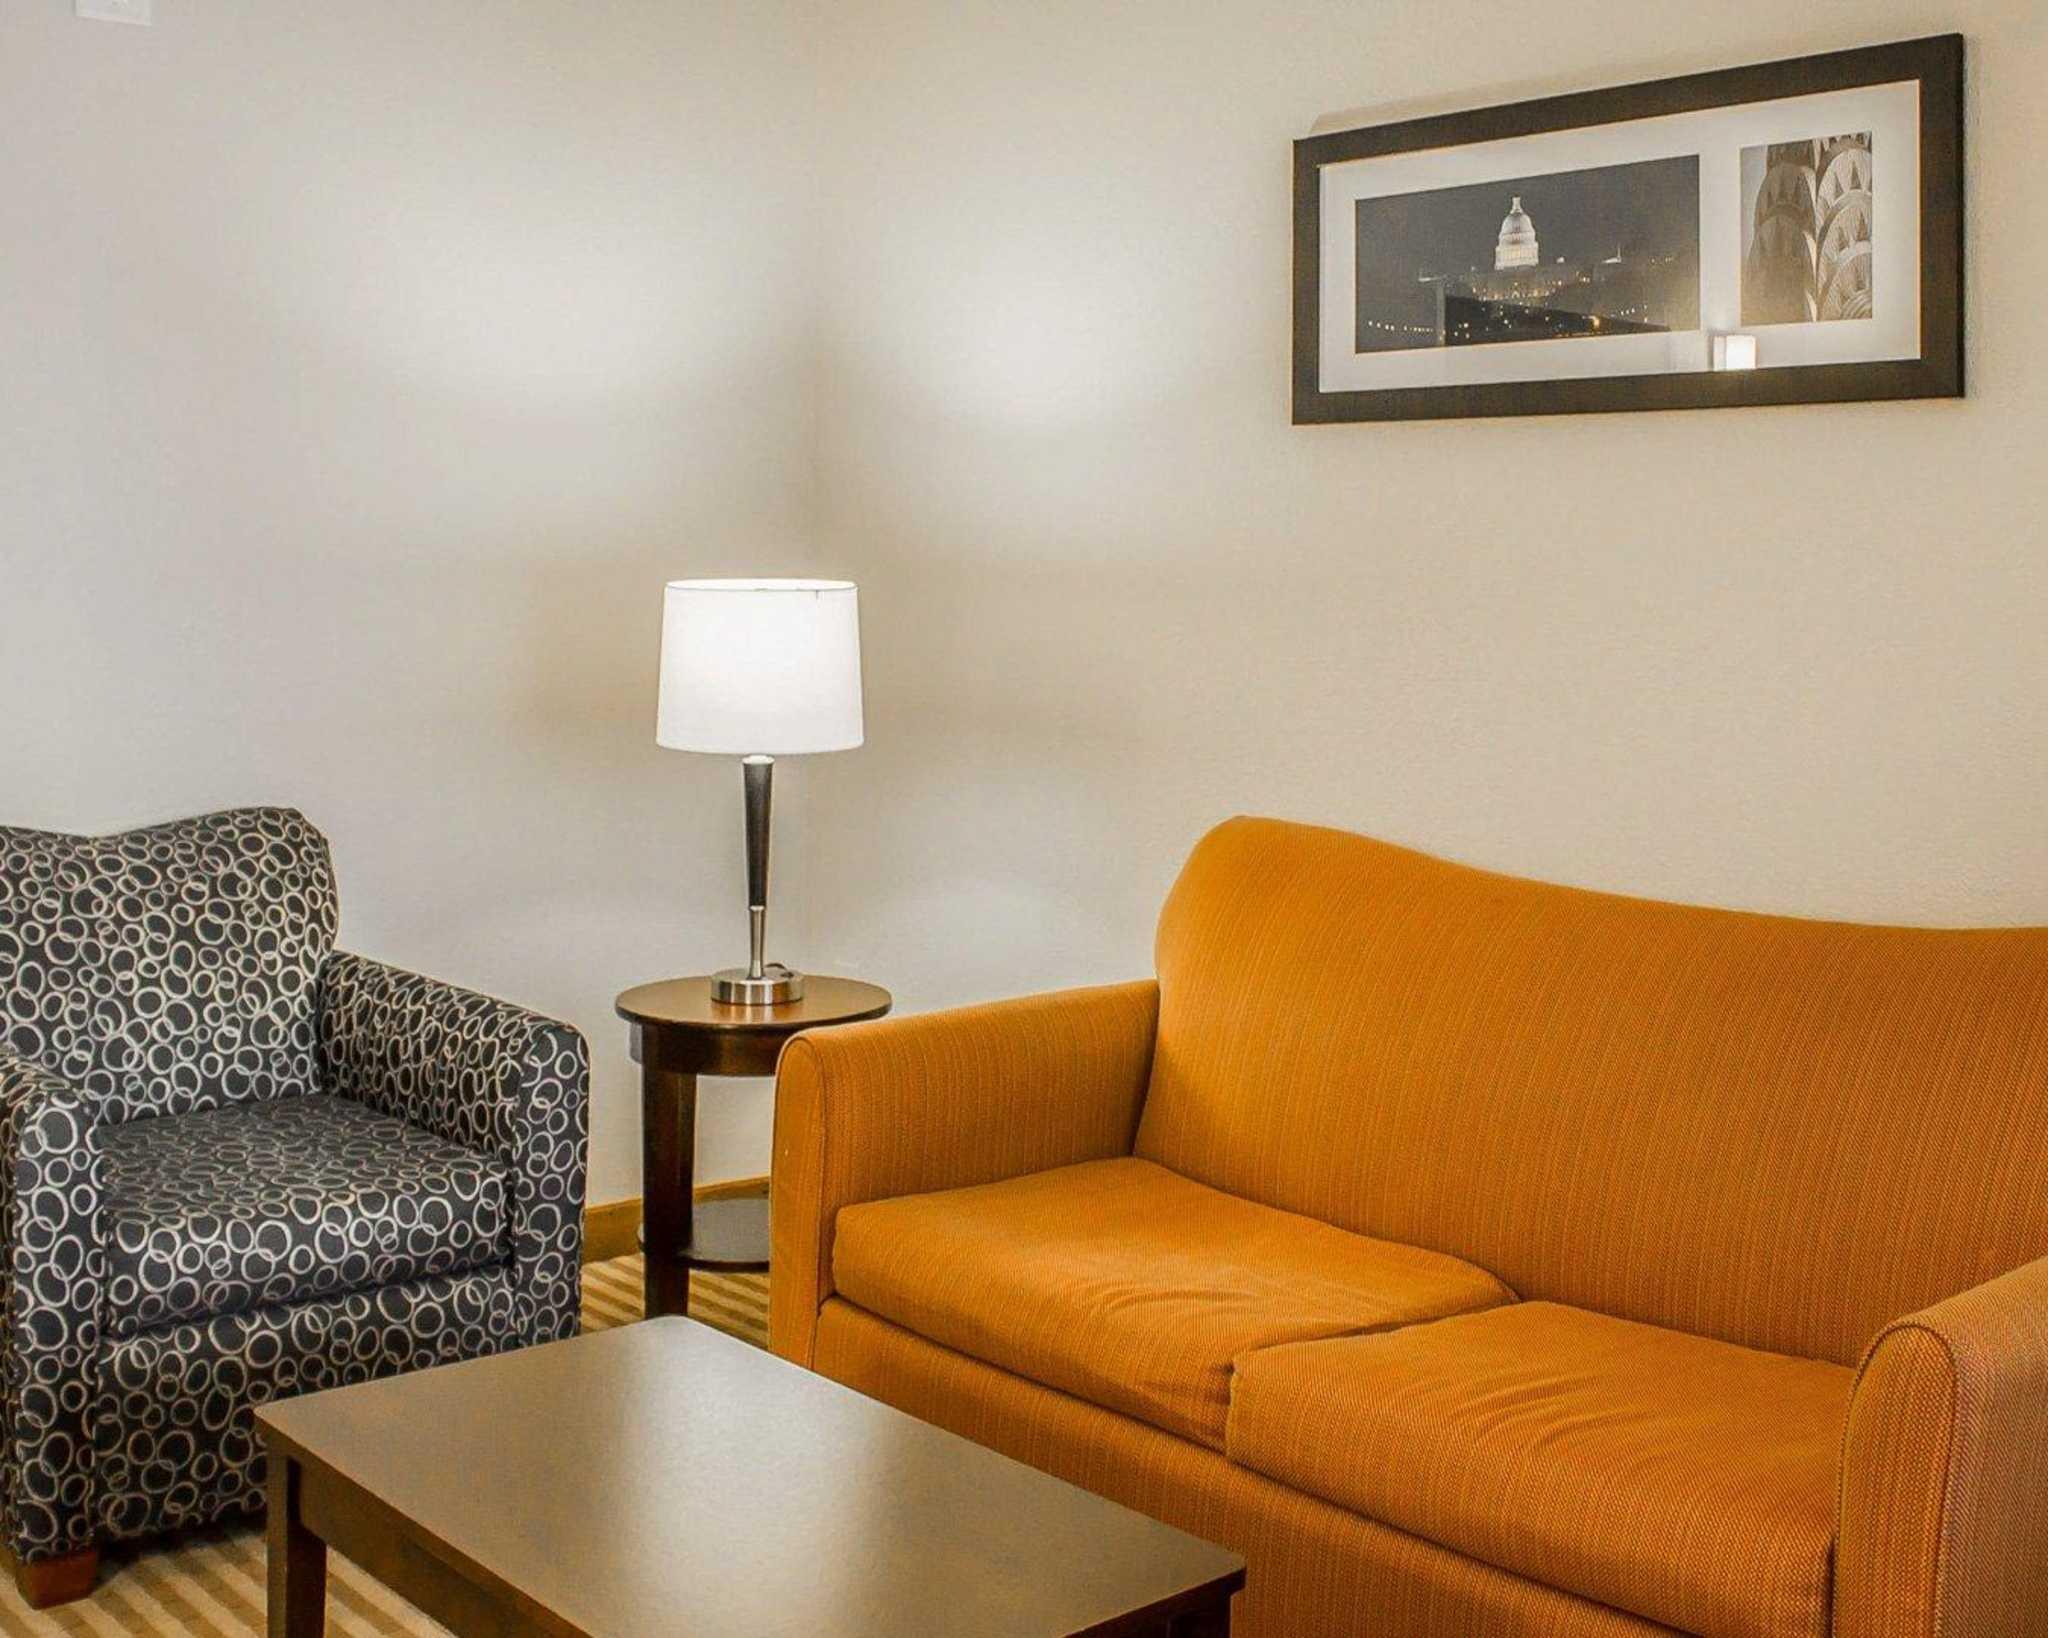 Comfort Suites East Broad at 270 image 9